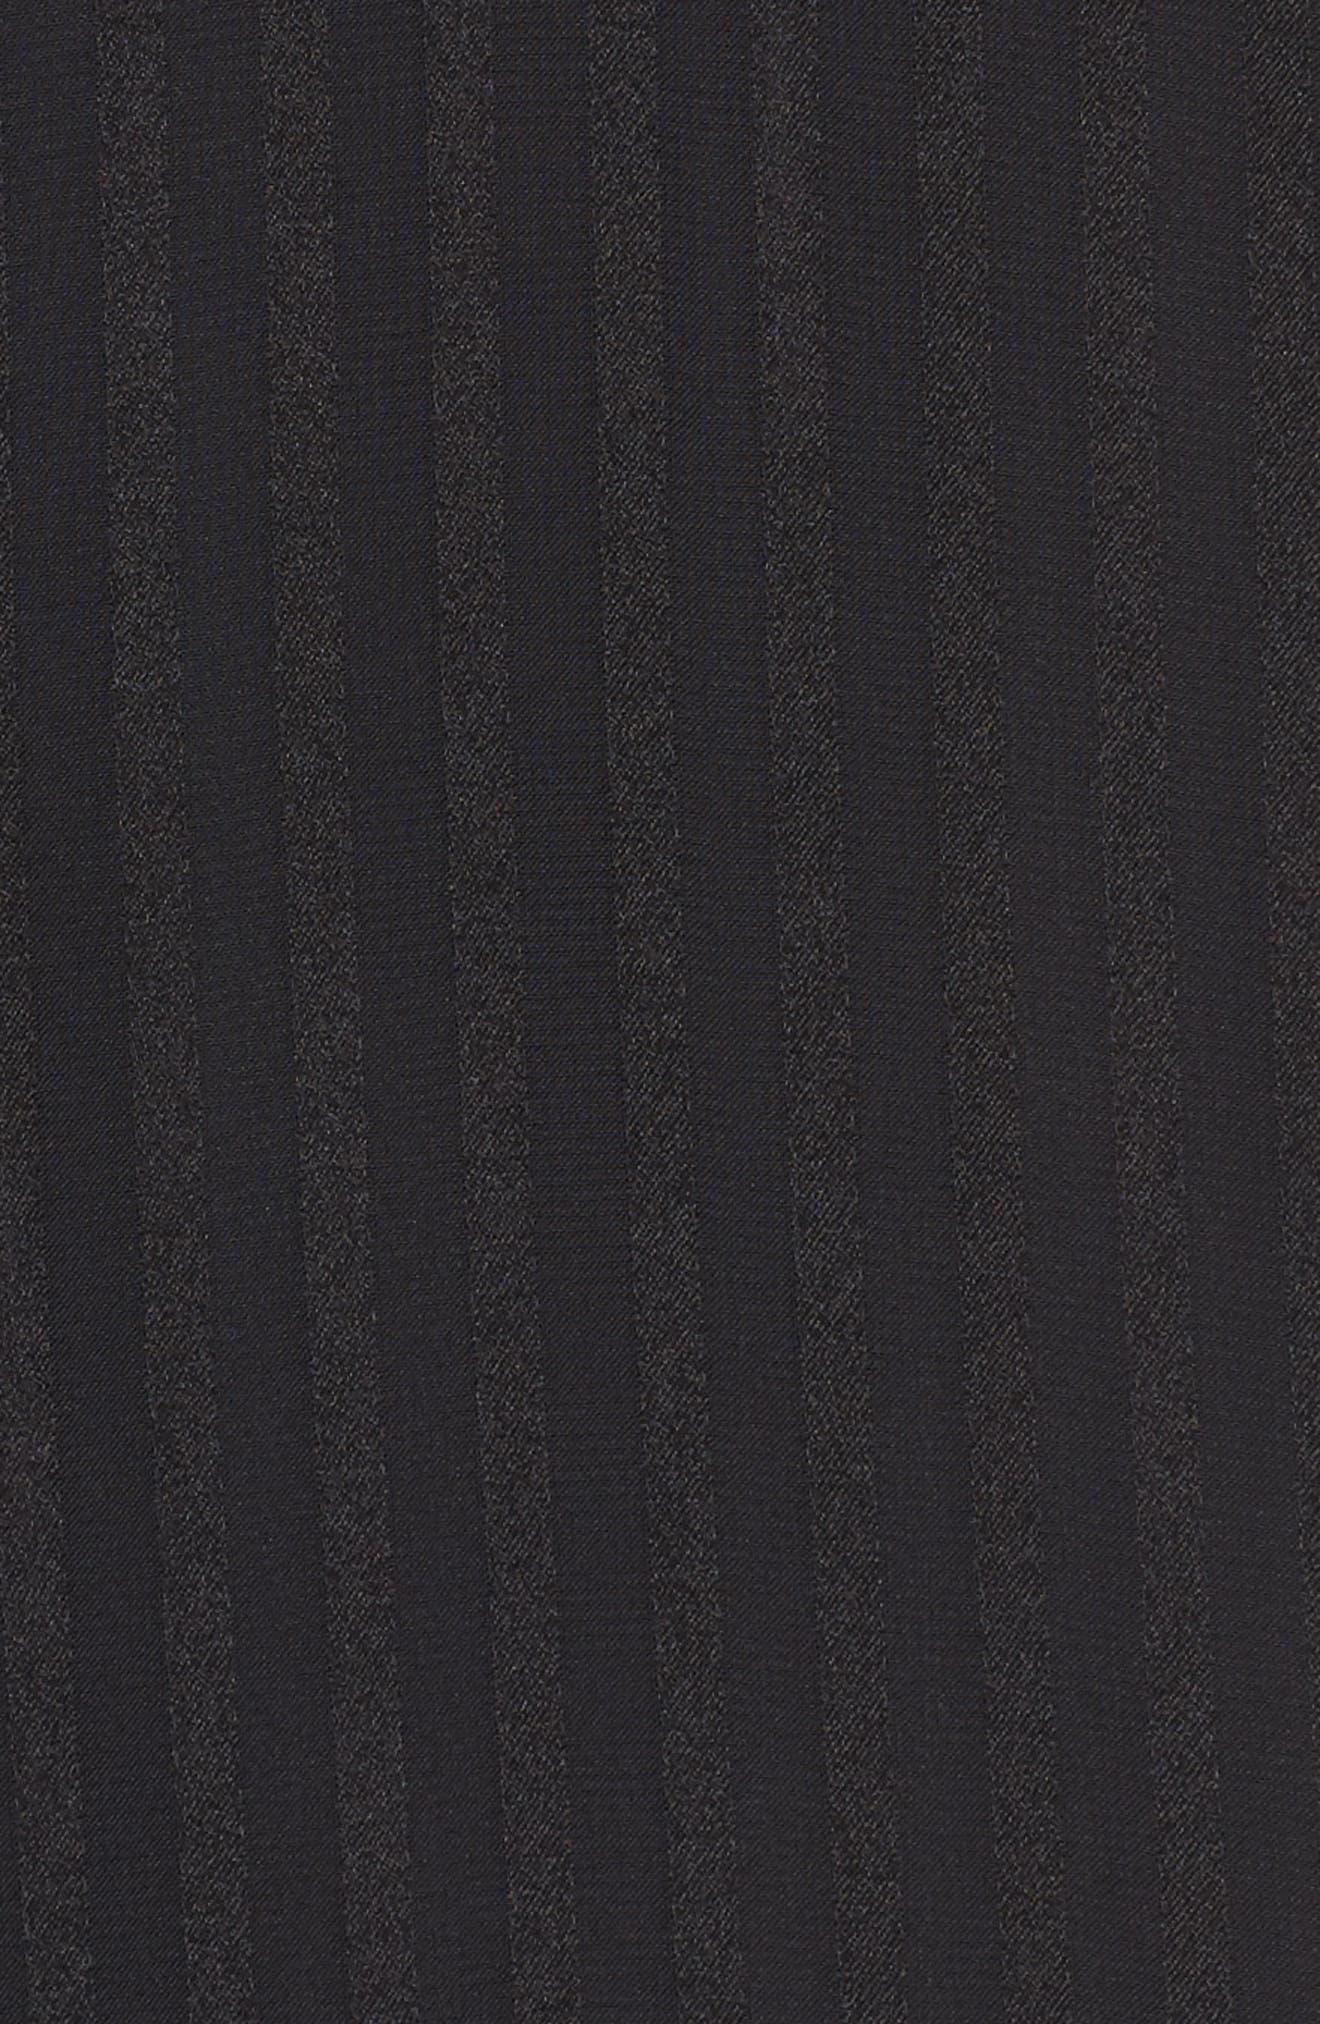 Midnight Sheer Blouse,                             Alternate thumbnail 5, color,                             001